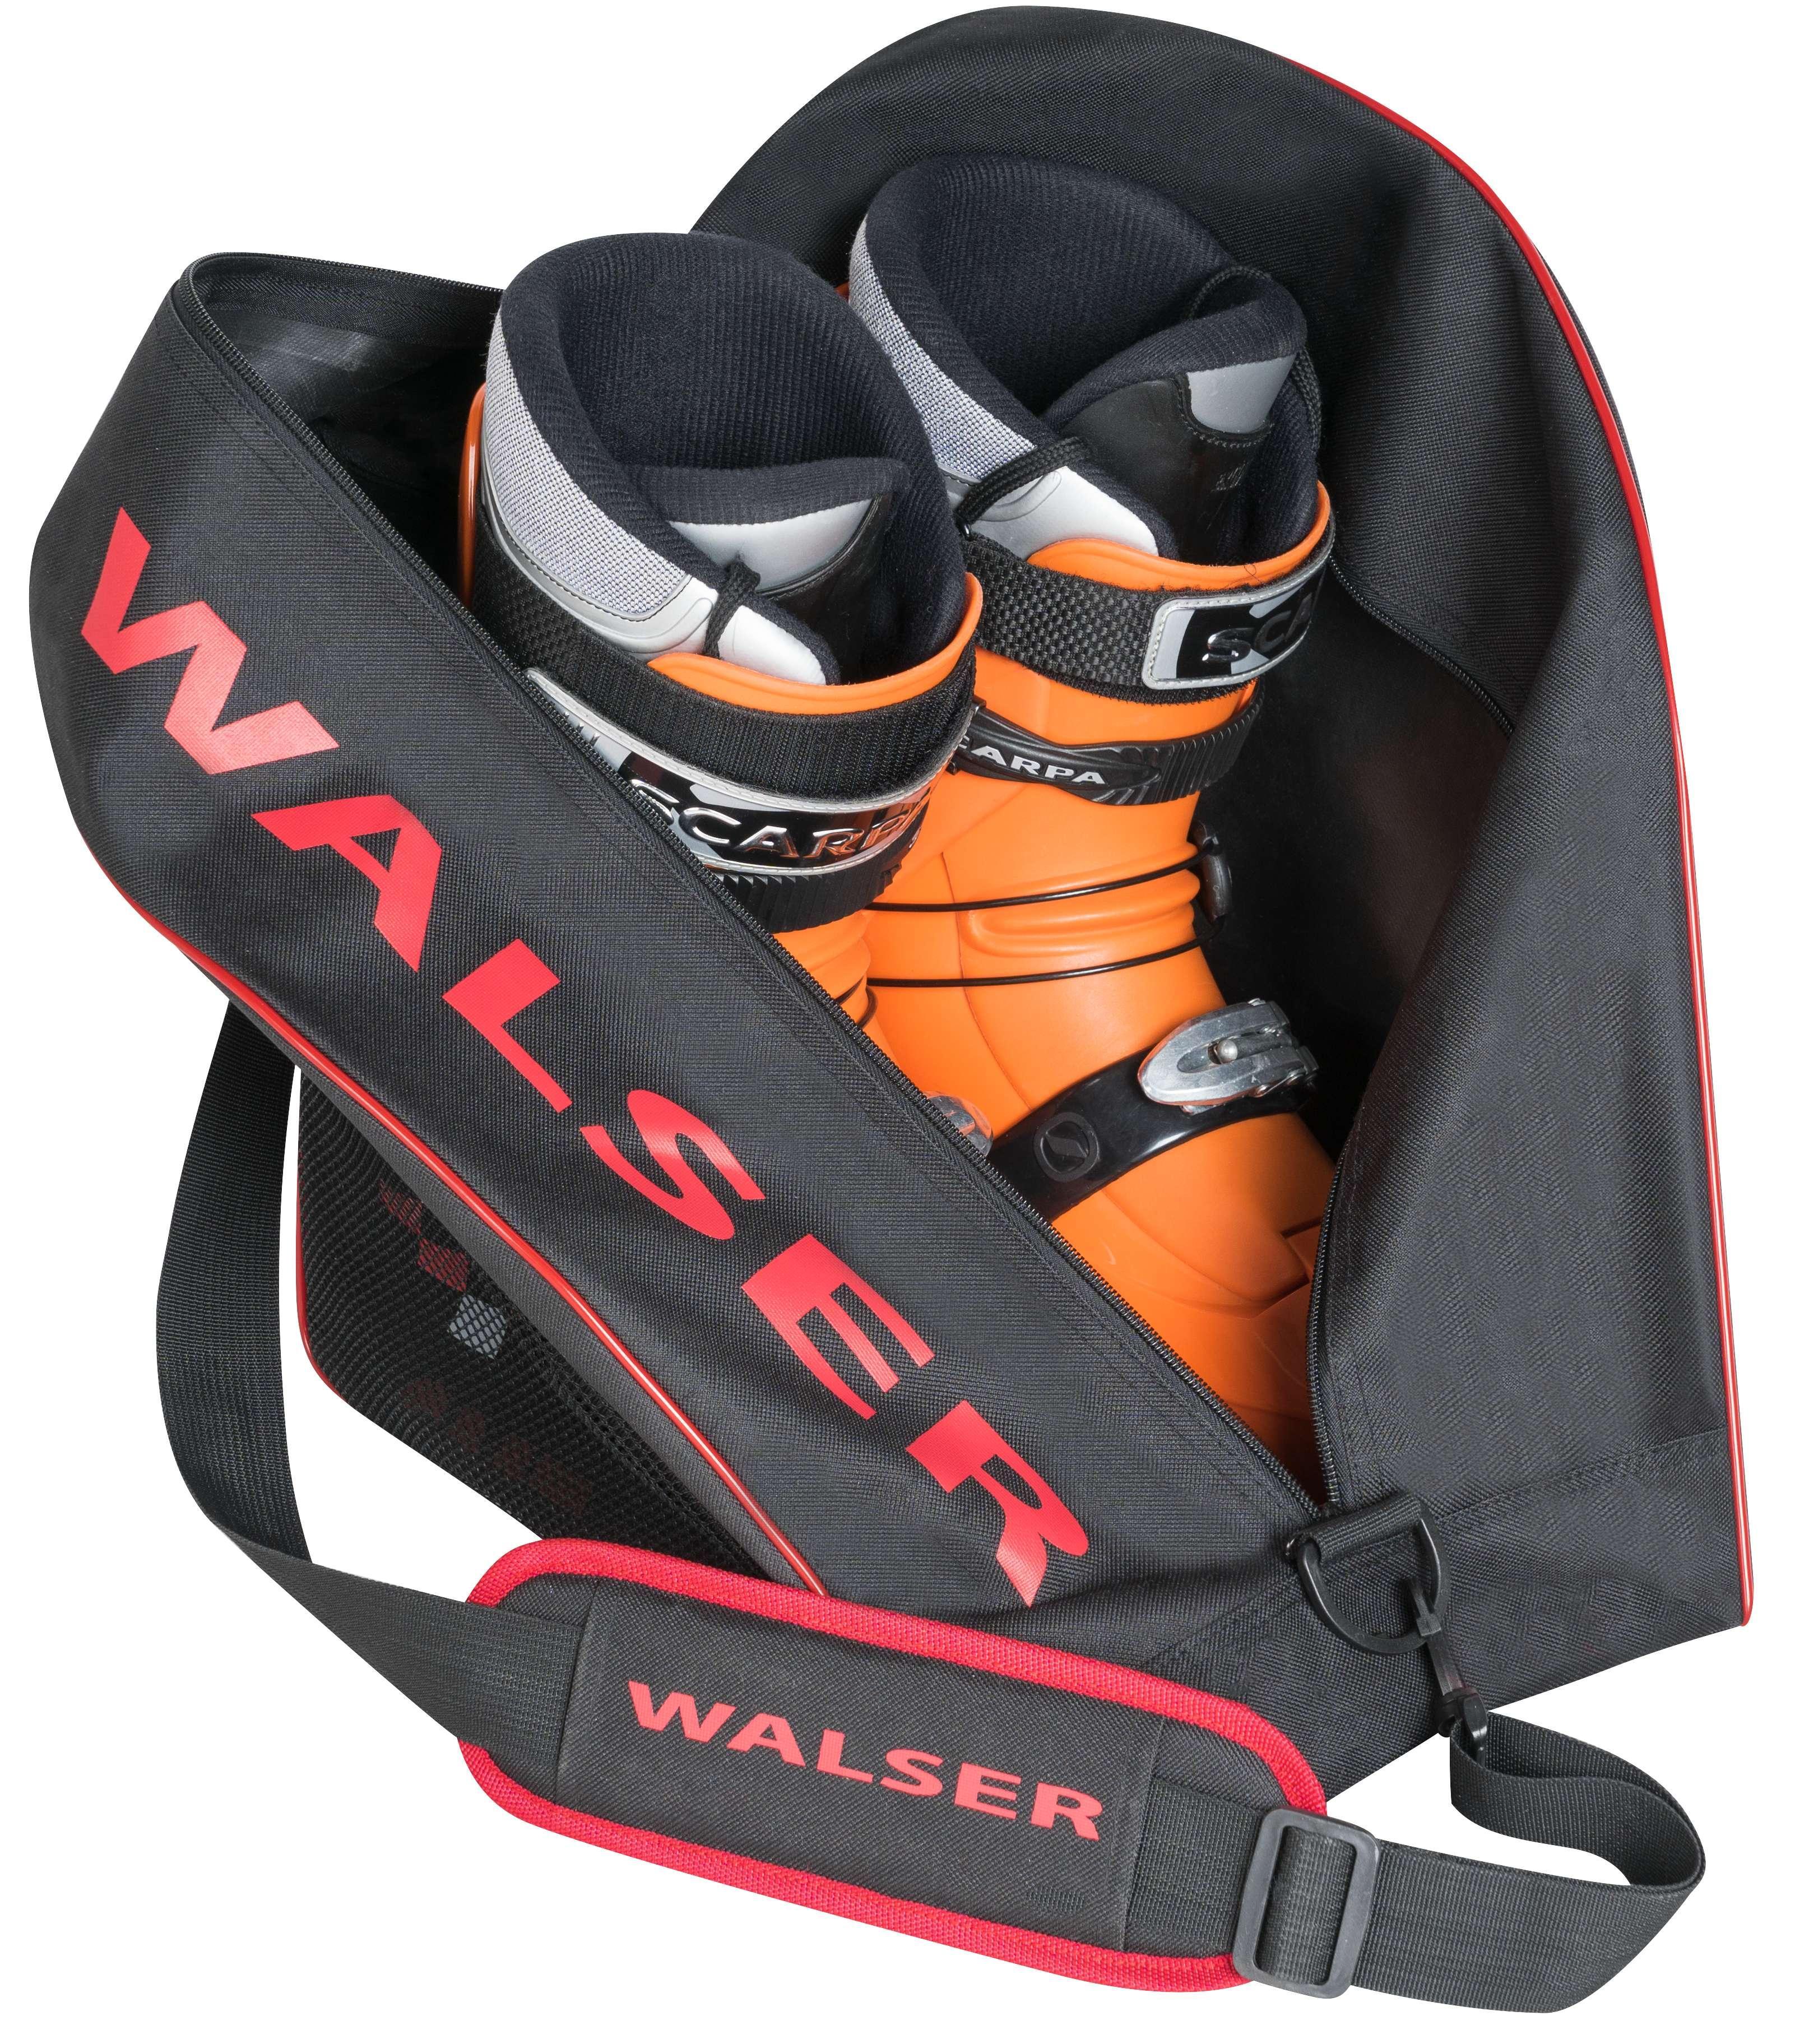 Ski bag WALSER 30550 expert knowledge